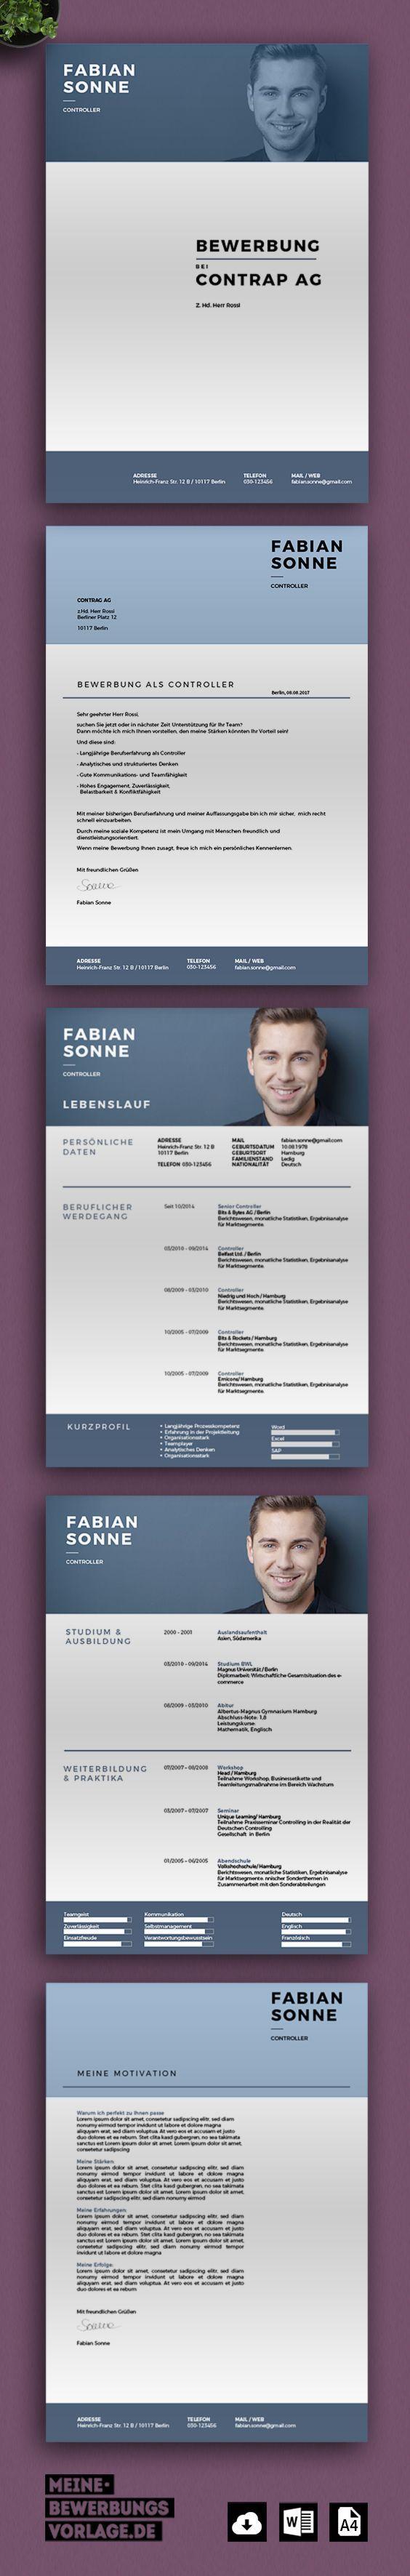 5126 best RESUME | CV | LEBENSLAUF images on Pinterest | Resume ...